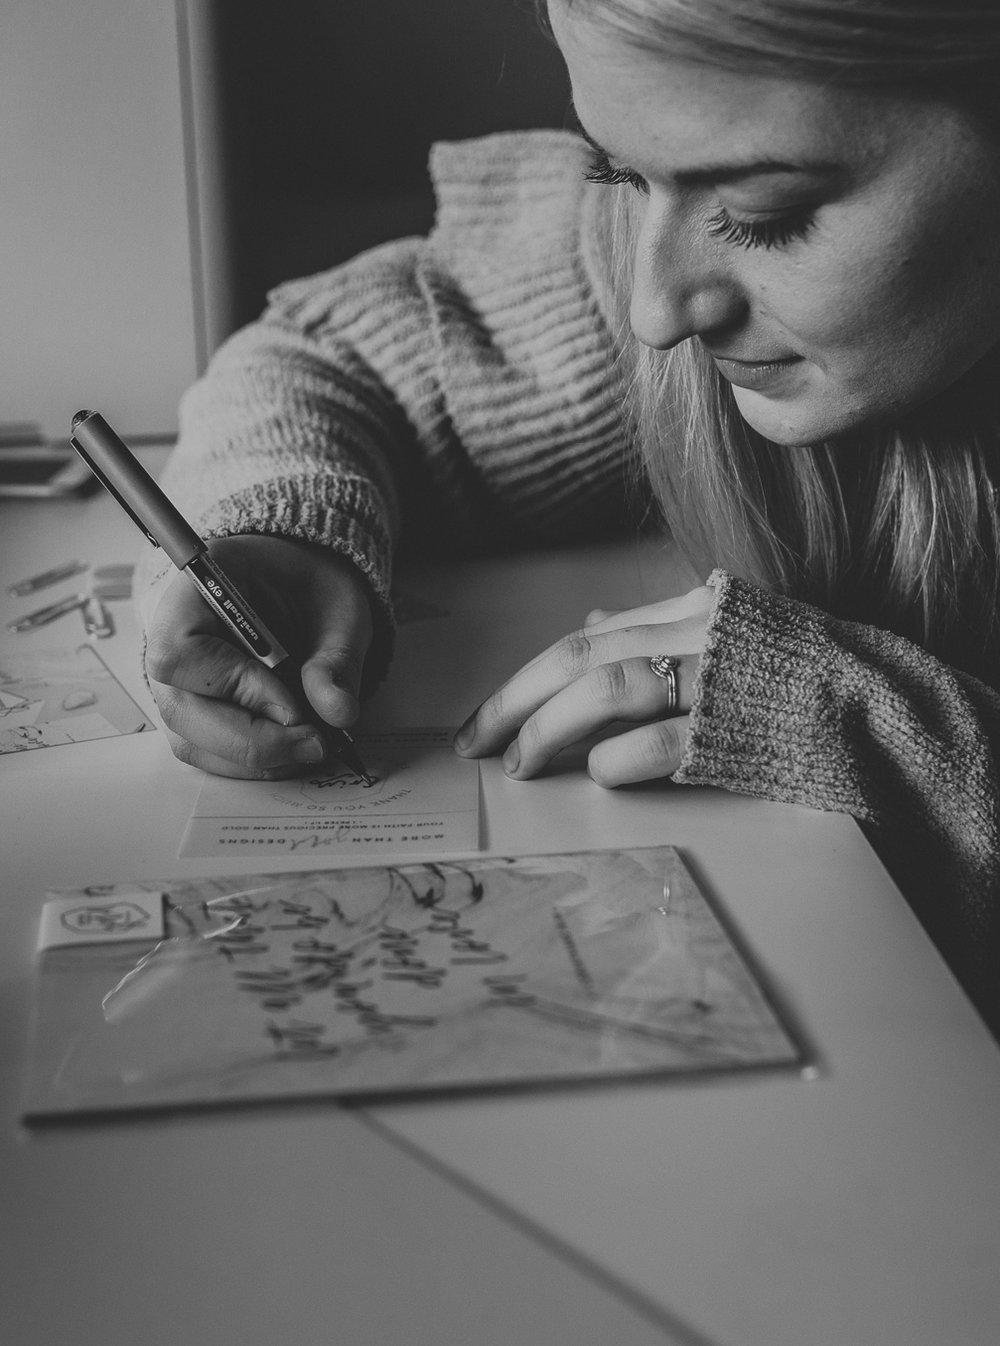 Beth writing an order